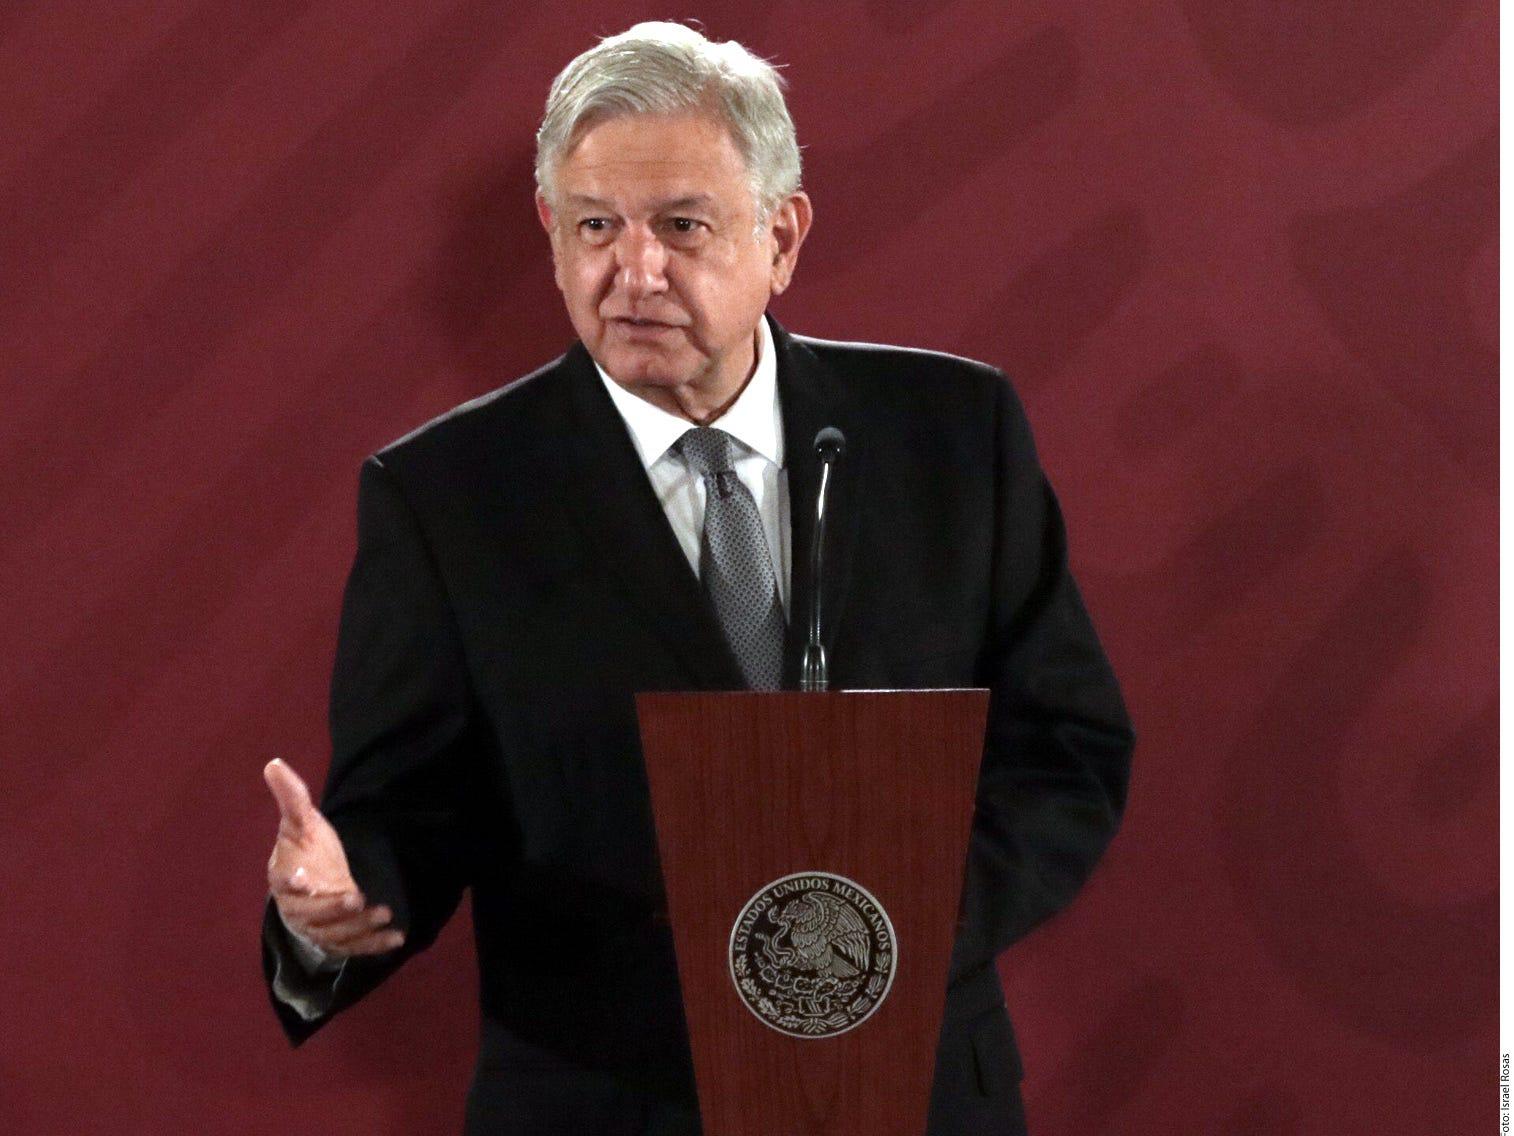 Presidente de México dice tener buena relación con Trump